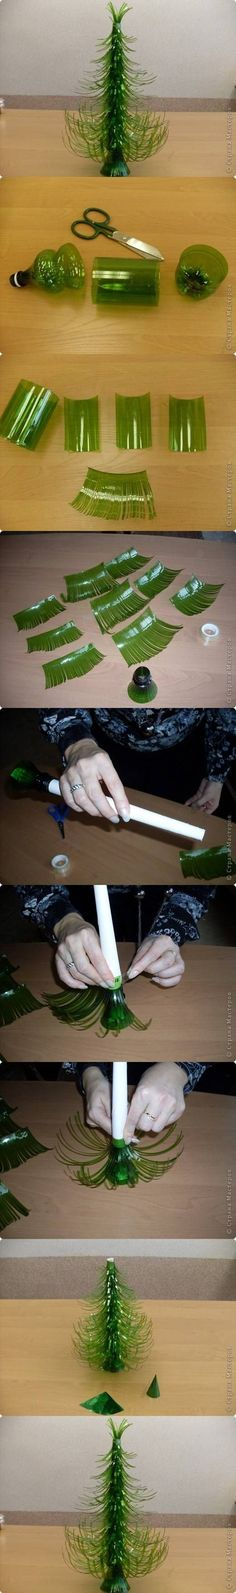 Plastic Bottle Craft Ideas for Kids19